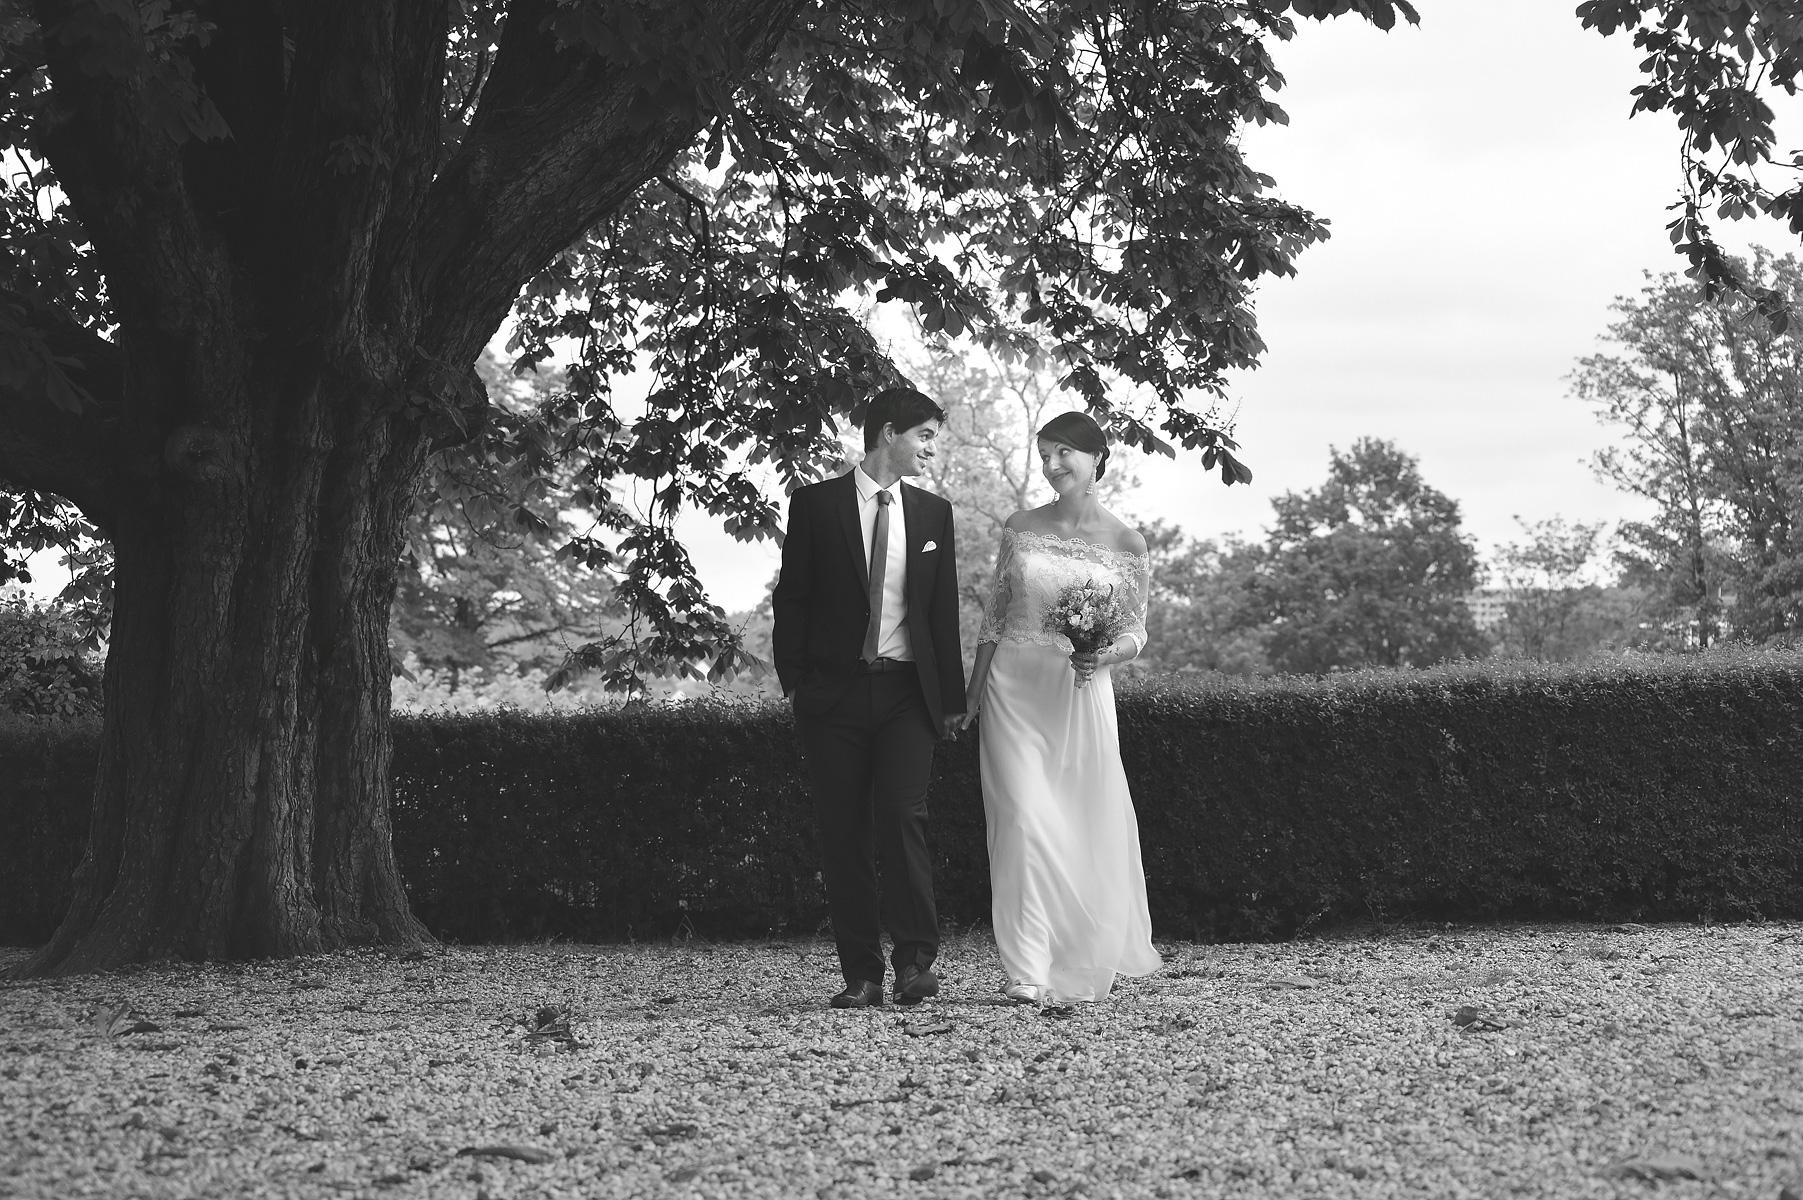 Hochzeitsreportage-Nicole-Bouillon_Nicole-Bouillon-Fotografie107